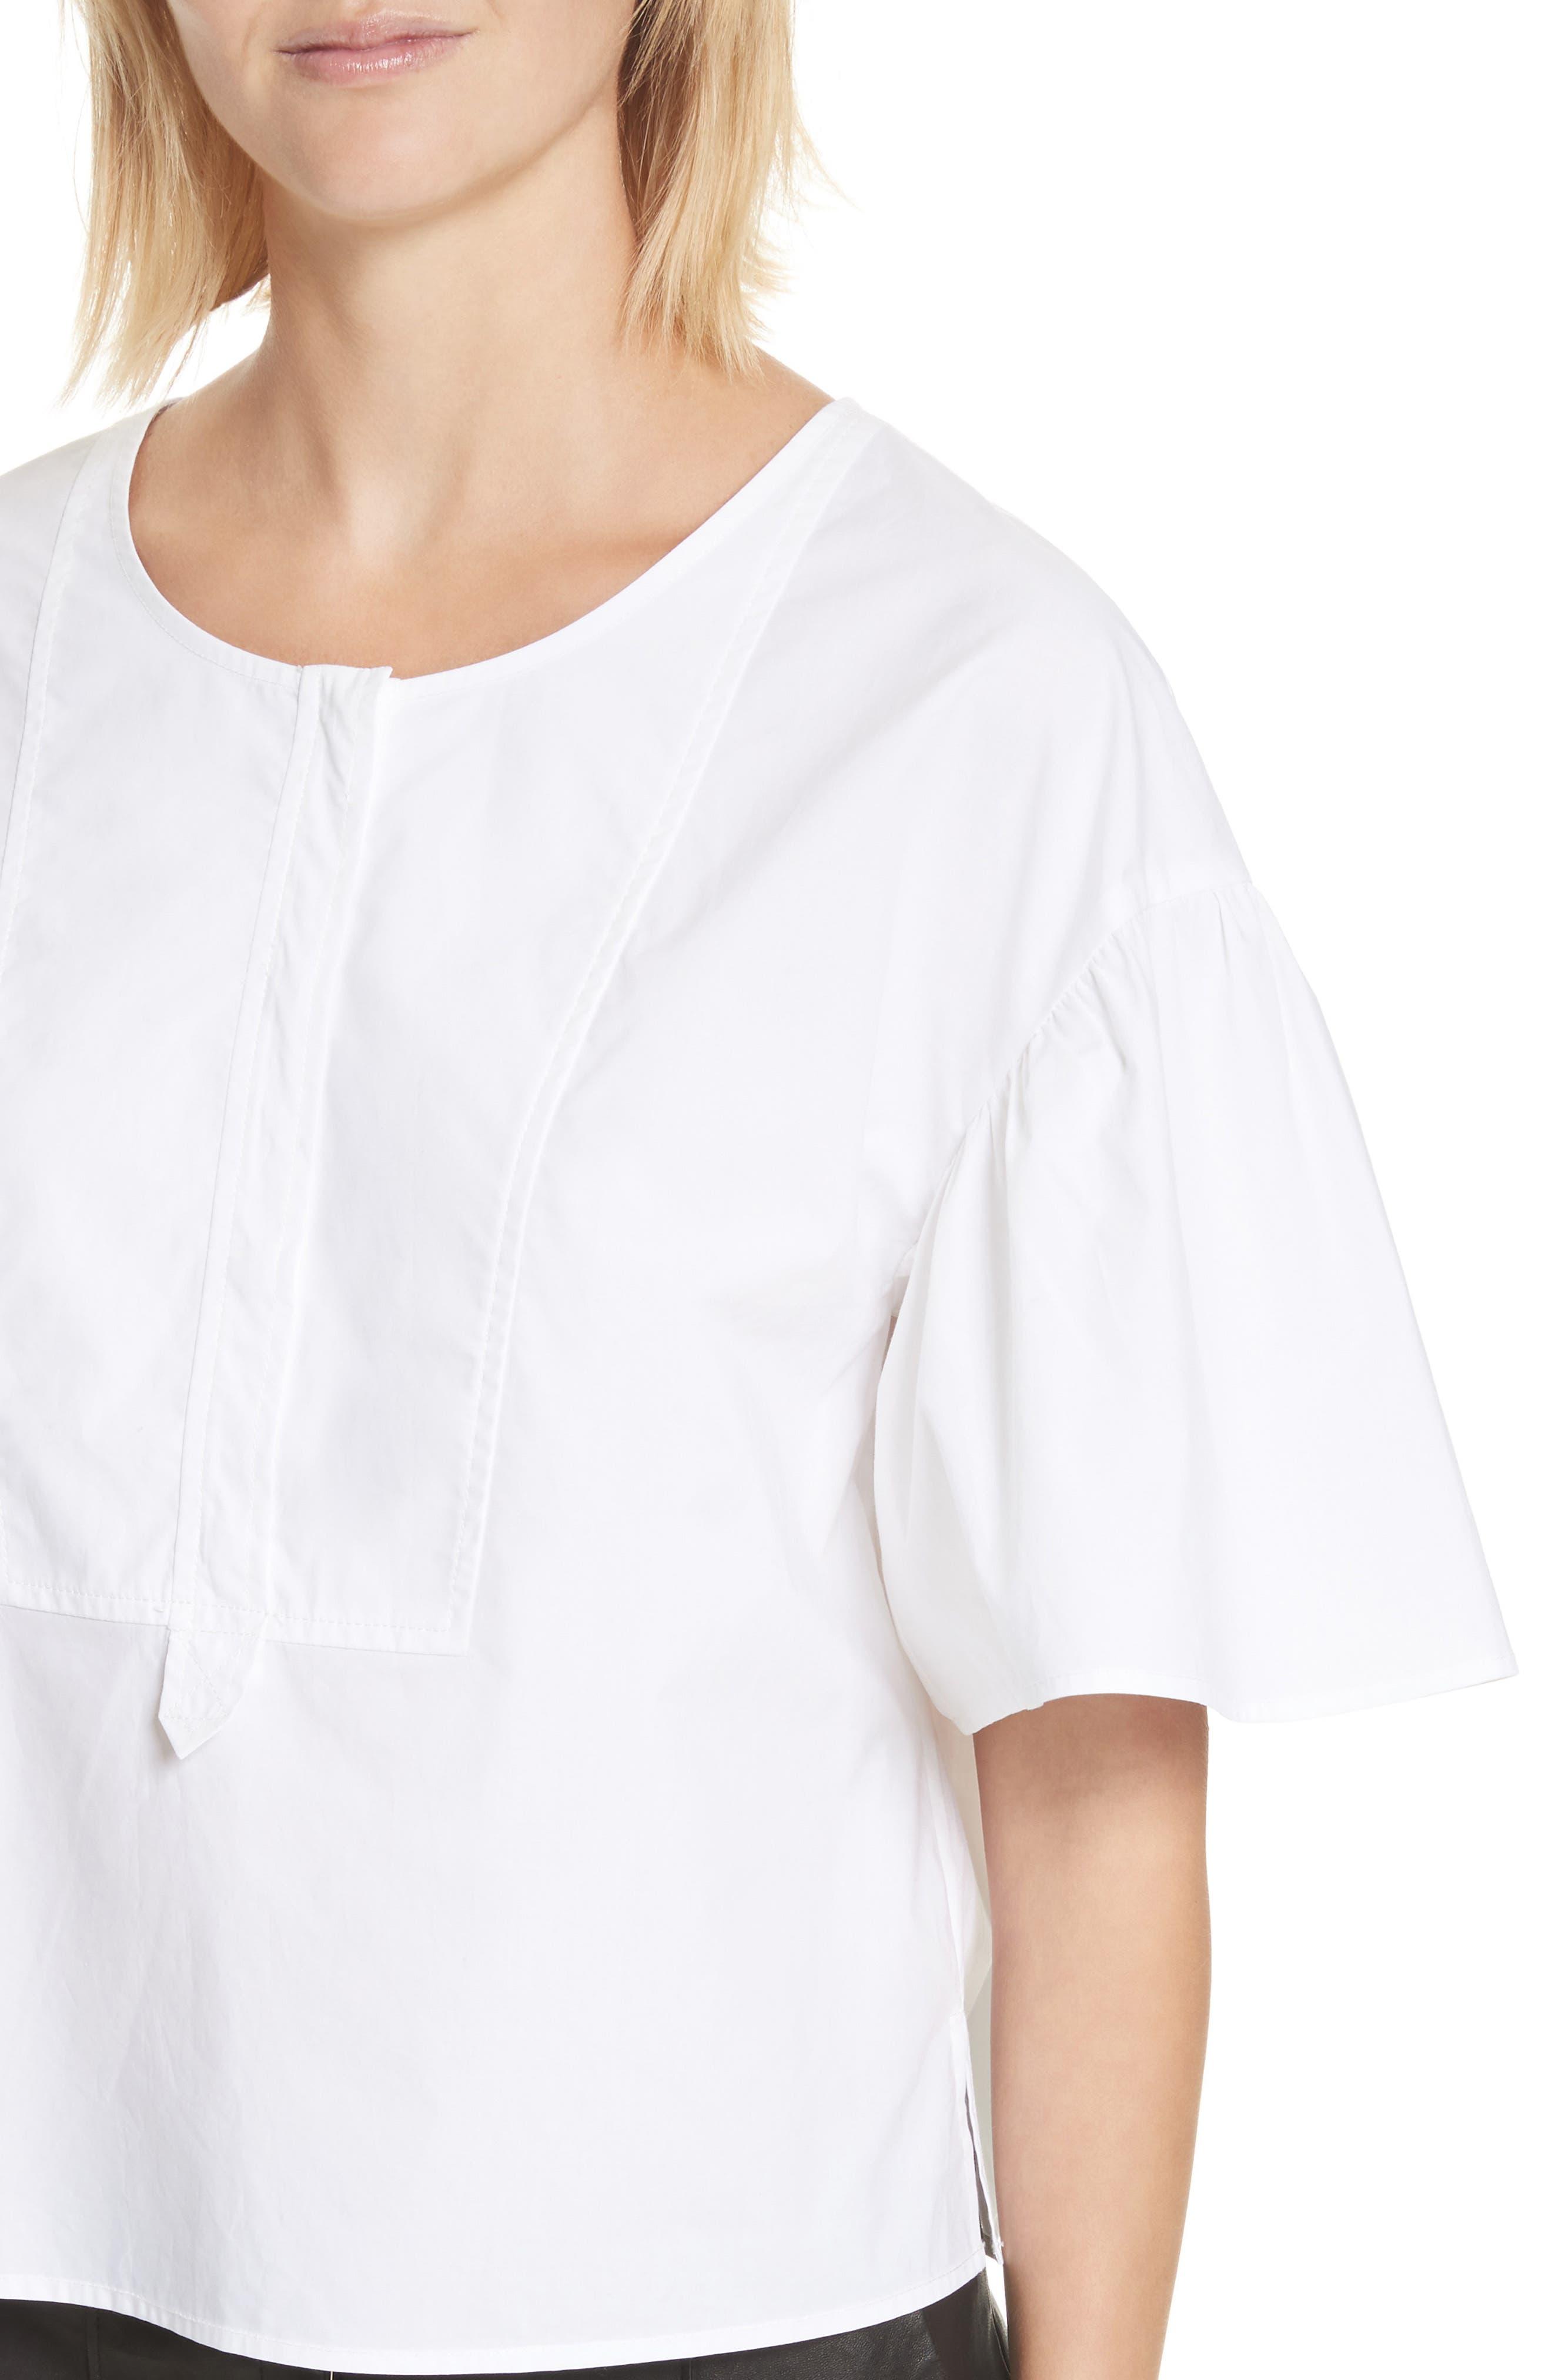 Kyrie Cotton Top,                             Alternate thumbnail 5, color,                             White